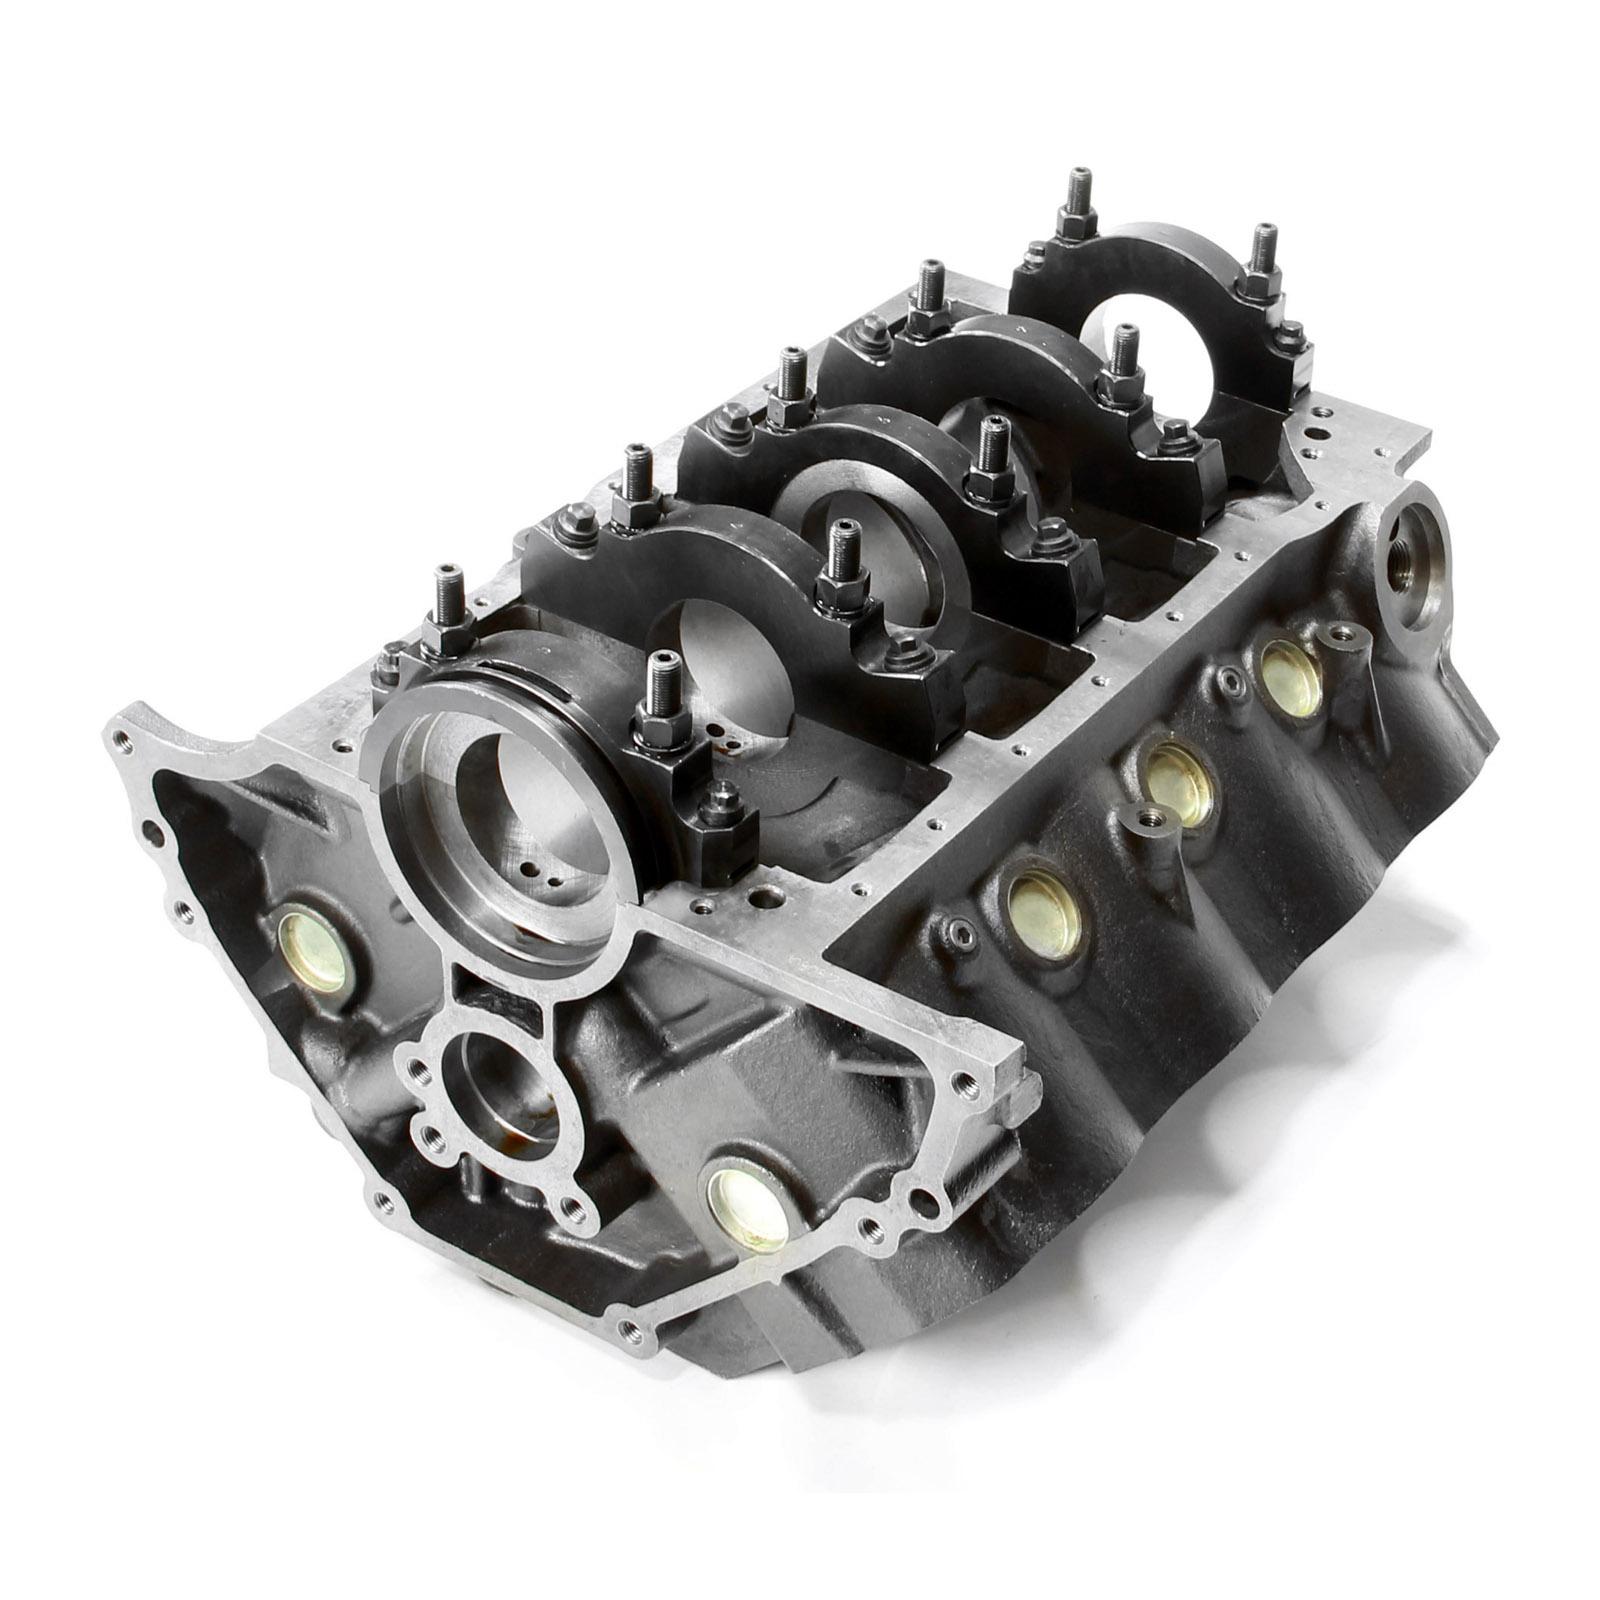 Chevy SBC 350 B-4.000 M-350 DH-9.025 4-Bolt Billet Main Iron Engine Block